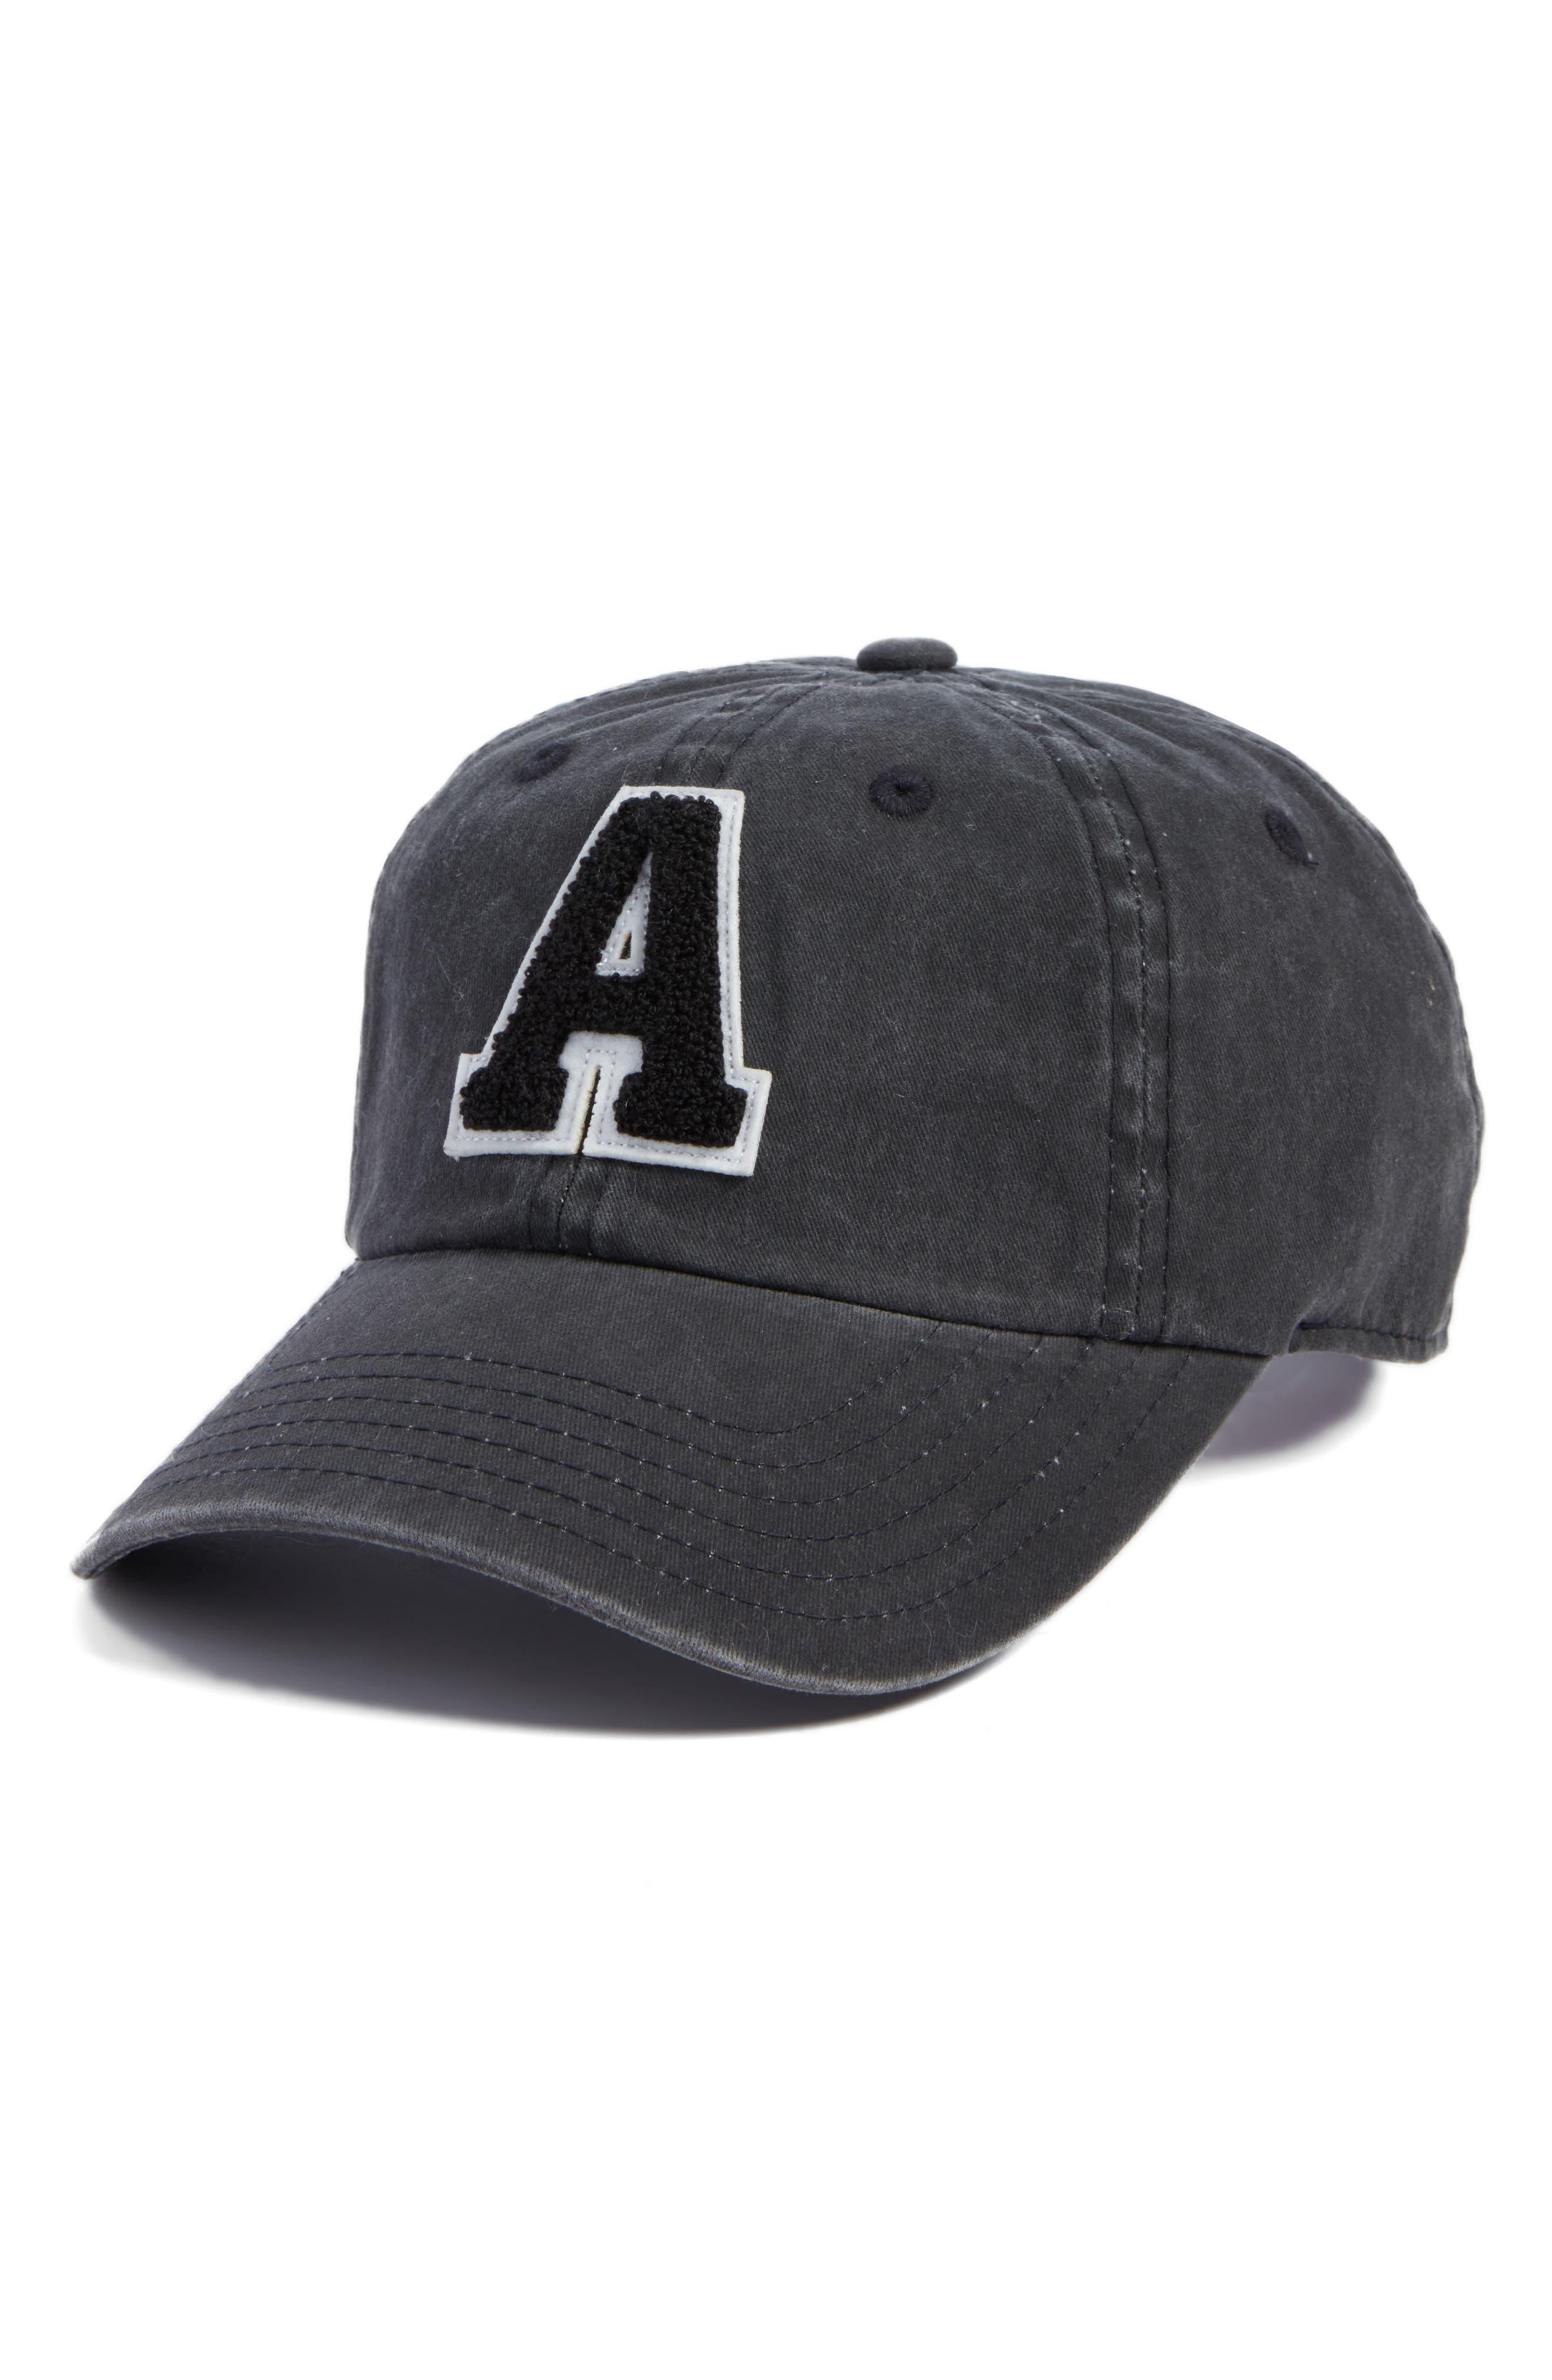 Main Image - American Needle Initial Baseball Cap